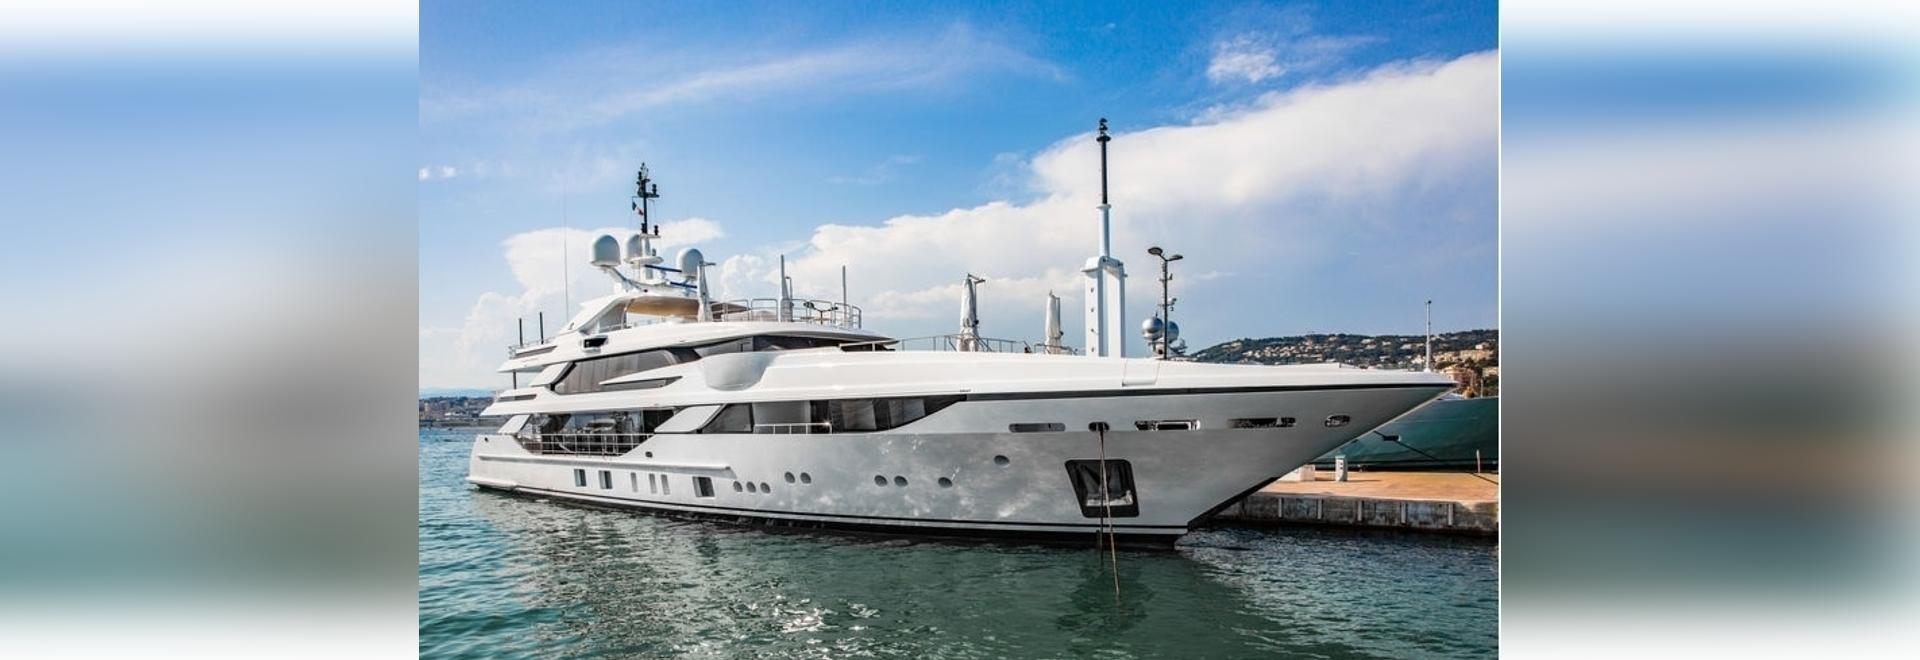 Yacht à moteur Benetti Zazou de 50m à vendre